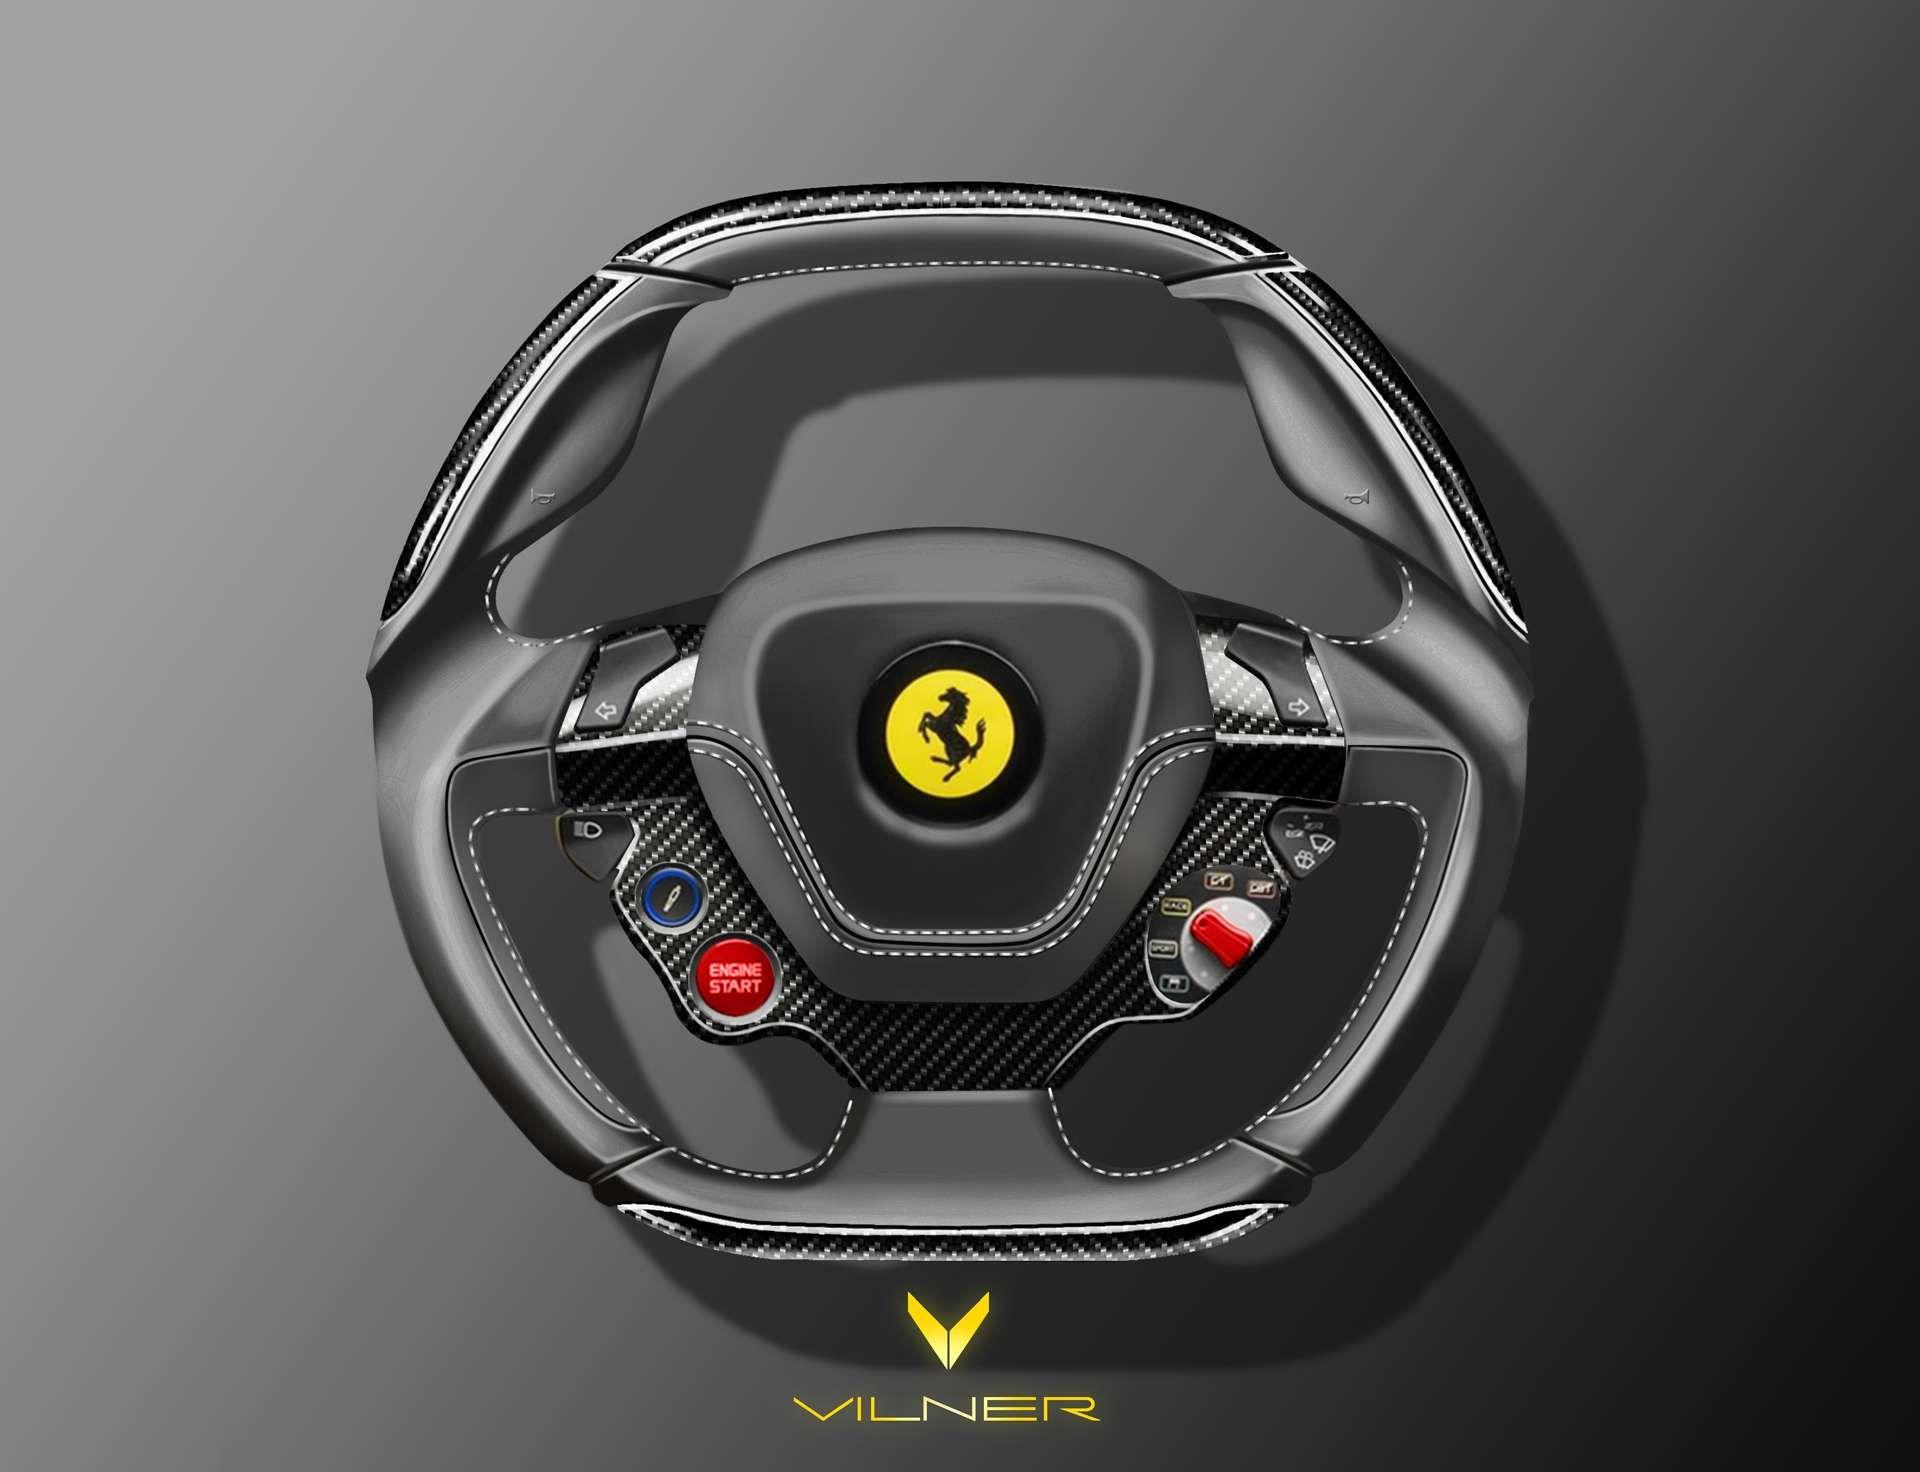 Vilner Ergonomic And Sport Steering Wheels Steering Wheel Car Modification Ideas Wheel